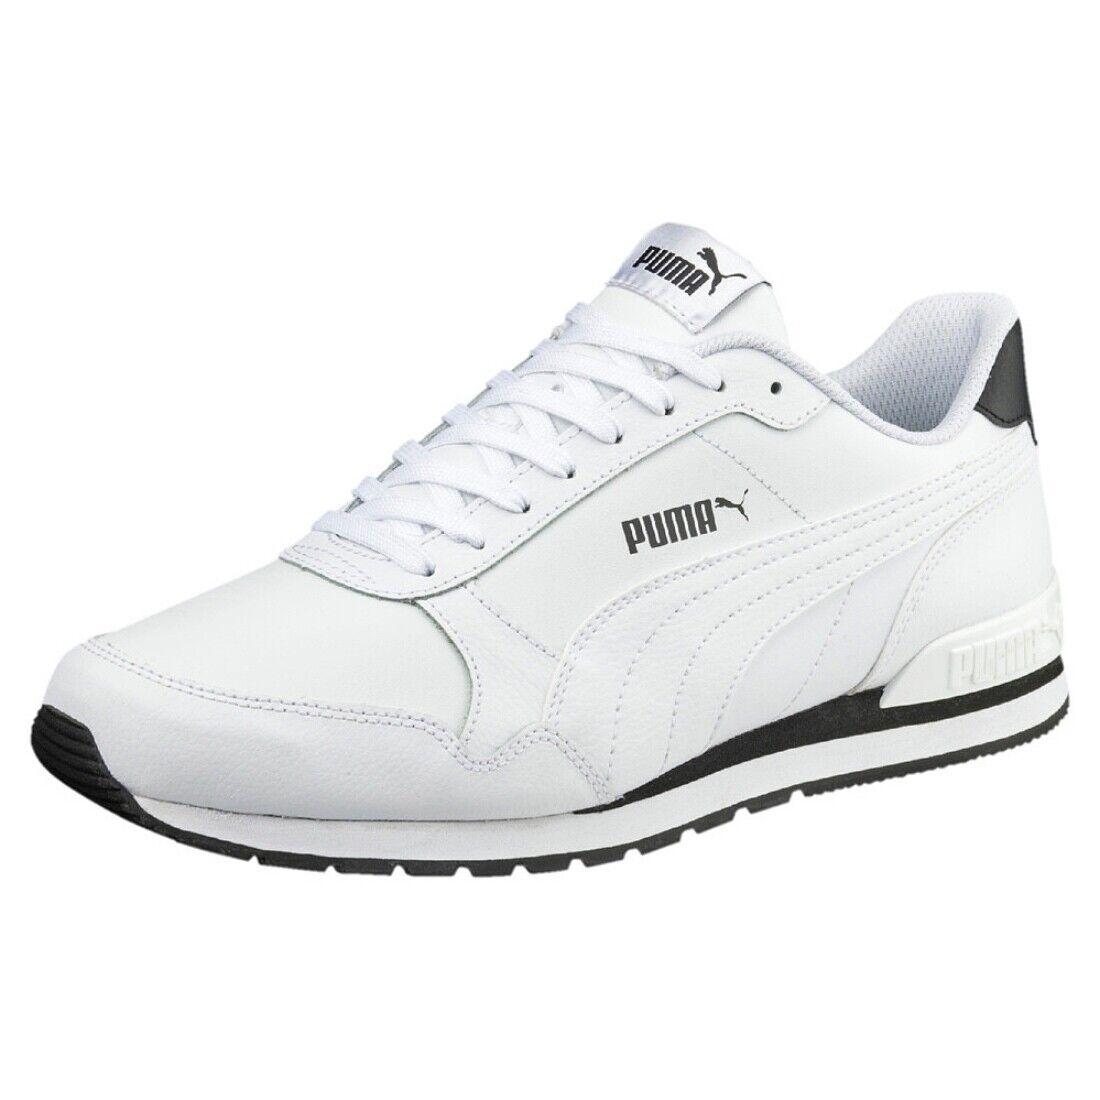 Puma st Runner v2 plein L Chaussures Baskets Sneakers Cuir 365277 Blanc et Noir